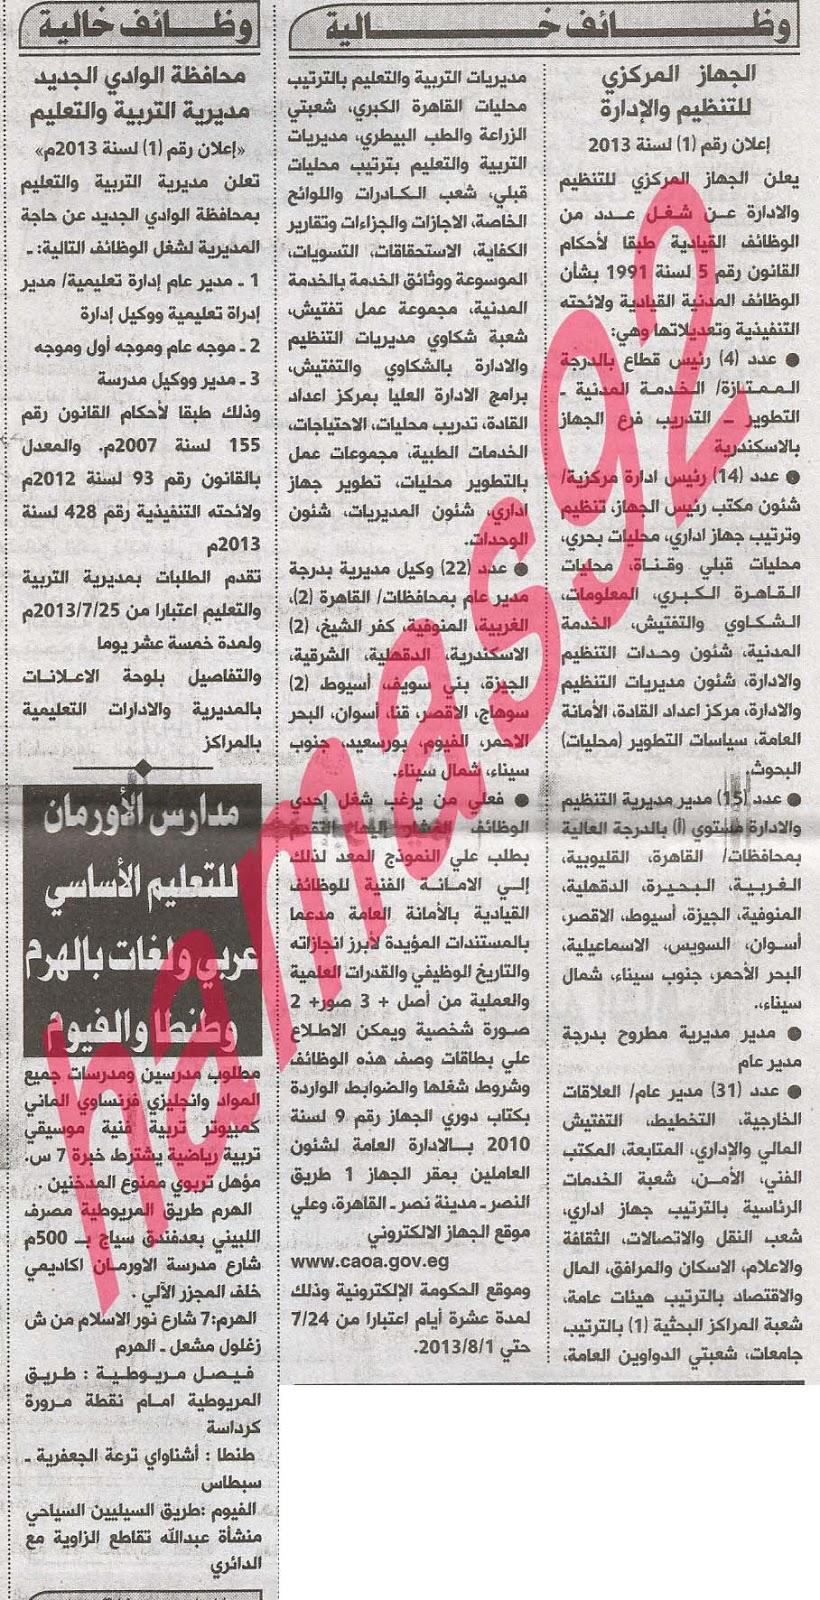 4f4b786a0 وظائف جريدة الاهرام المصرية 15 رمضان - وظائف خاليه